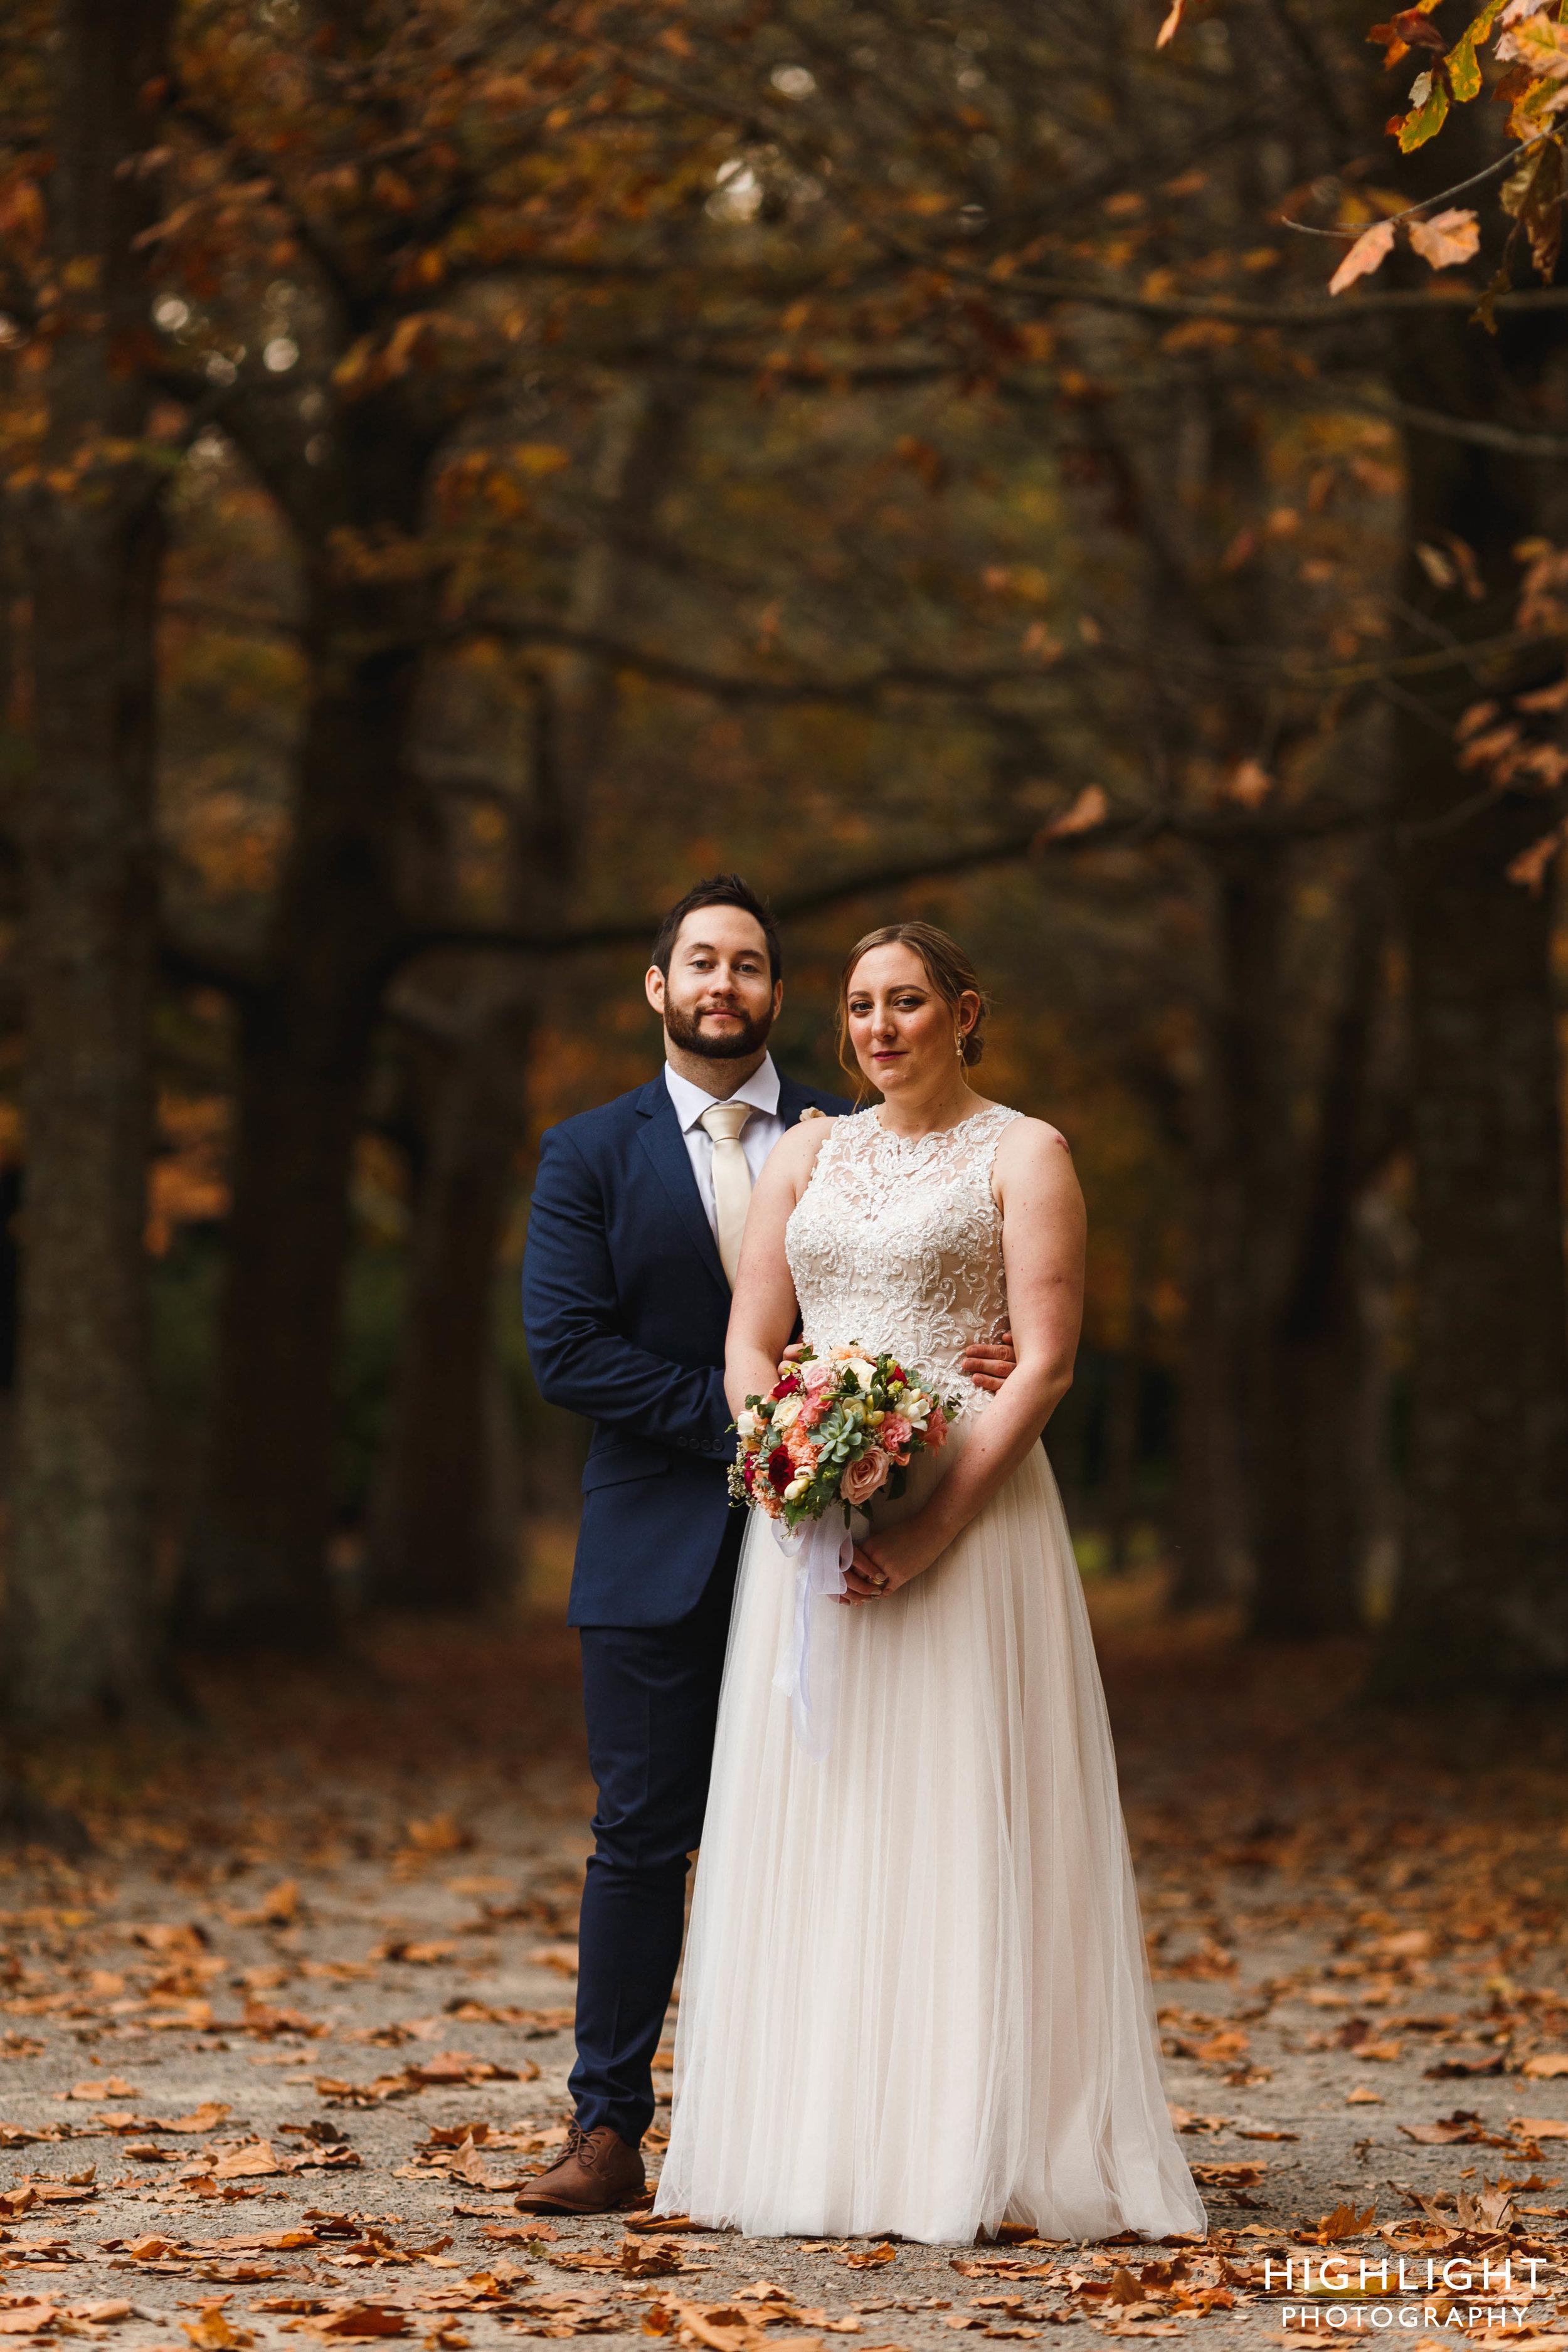 highlight-wedding-photography-palmerston-north-new-zealand-manawatu-chalet-70.jpg